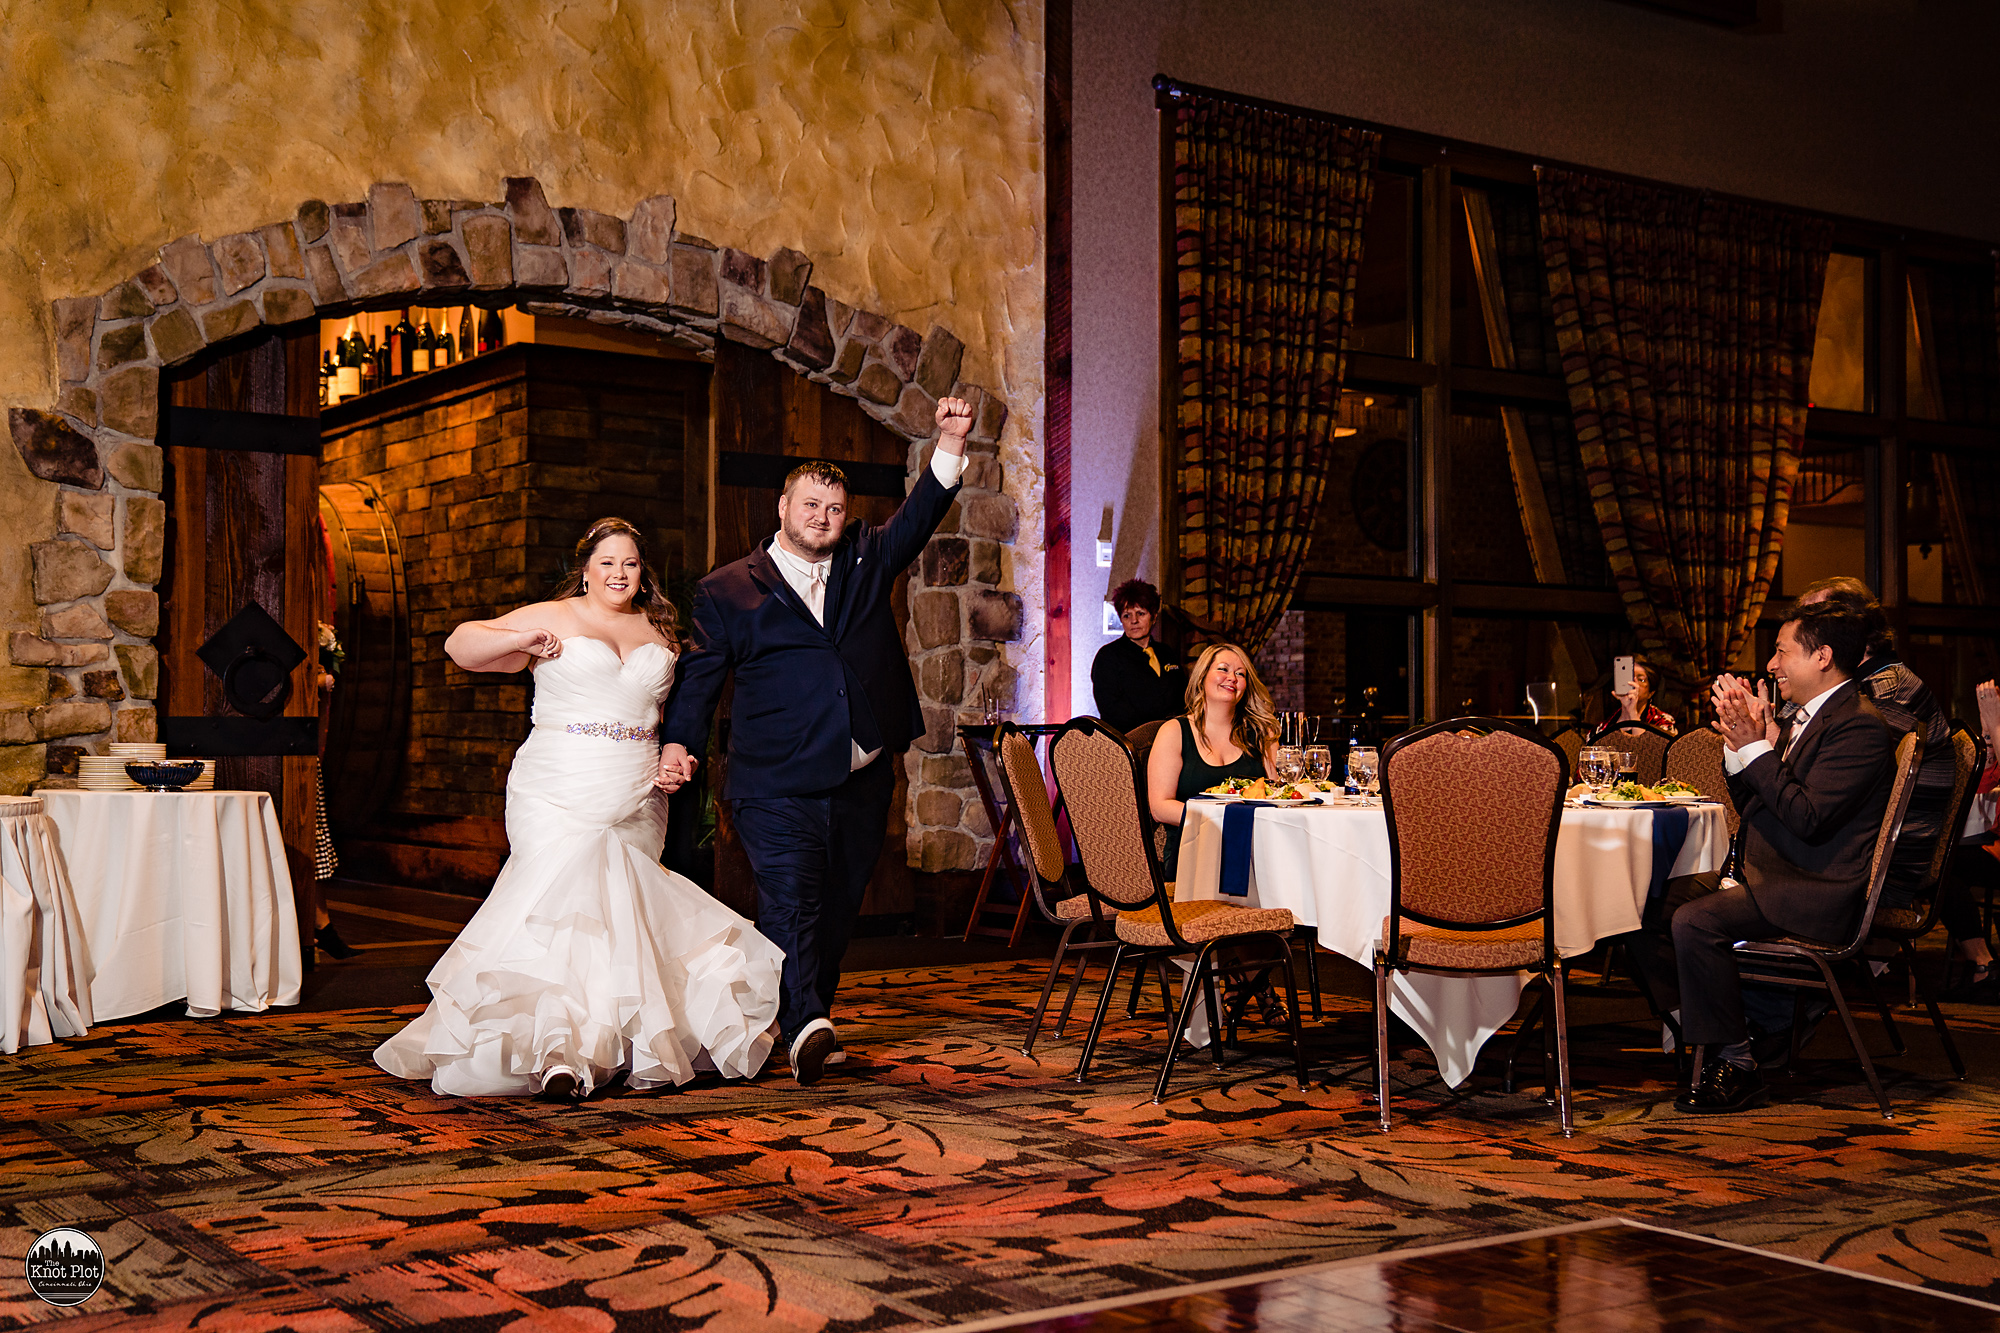 Oscar-Event-Center-Jungle-Jims-Cincinnati-Wedding-Photography-18.jpg